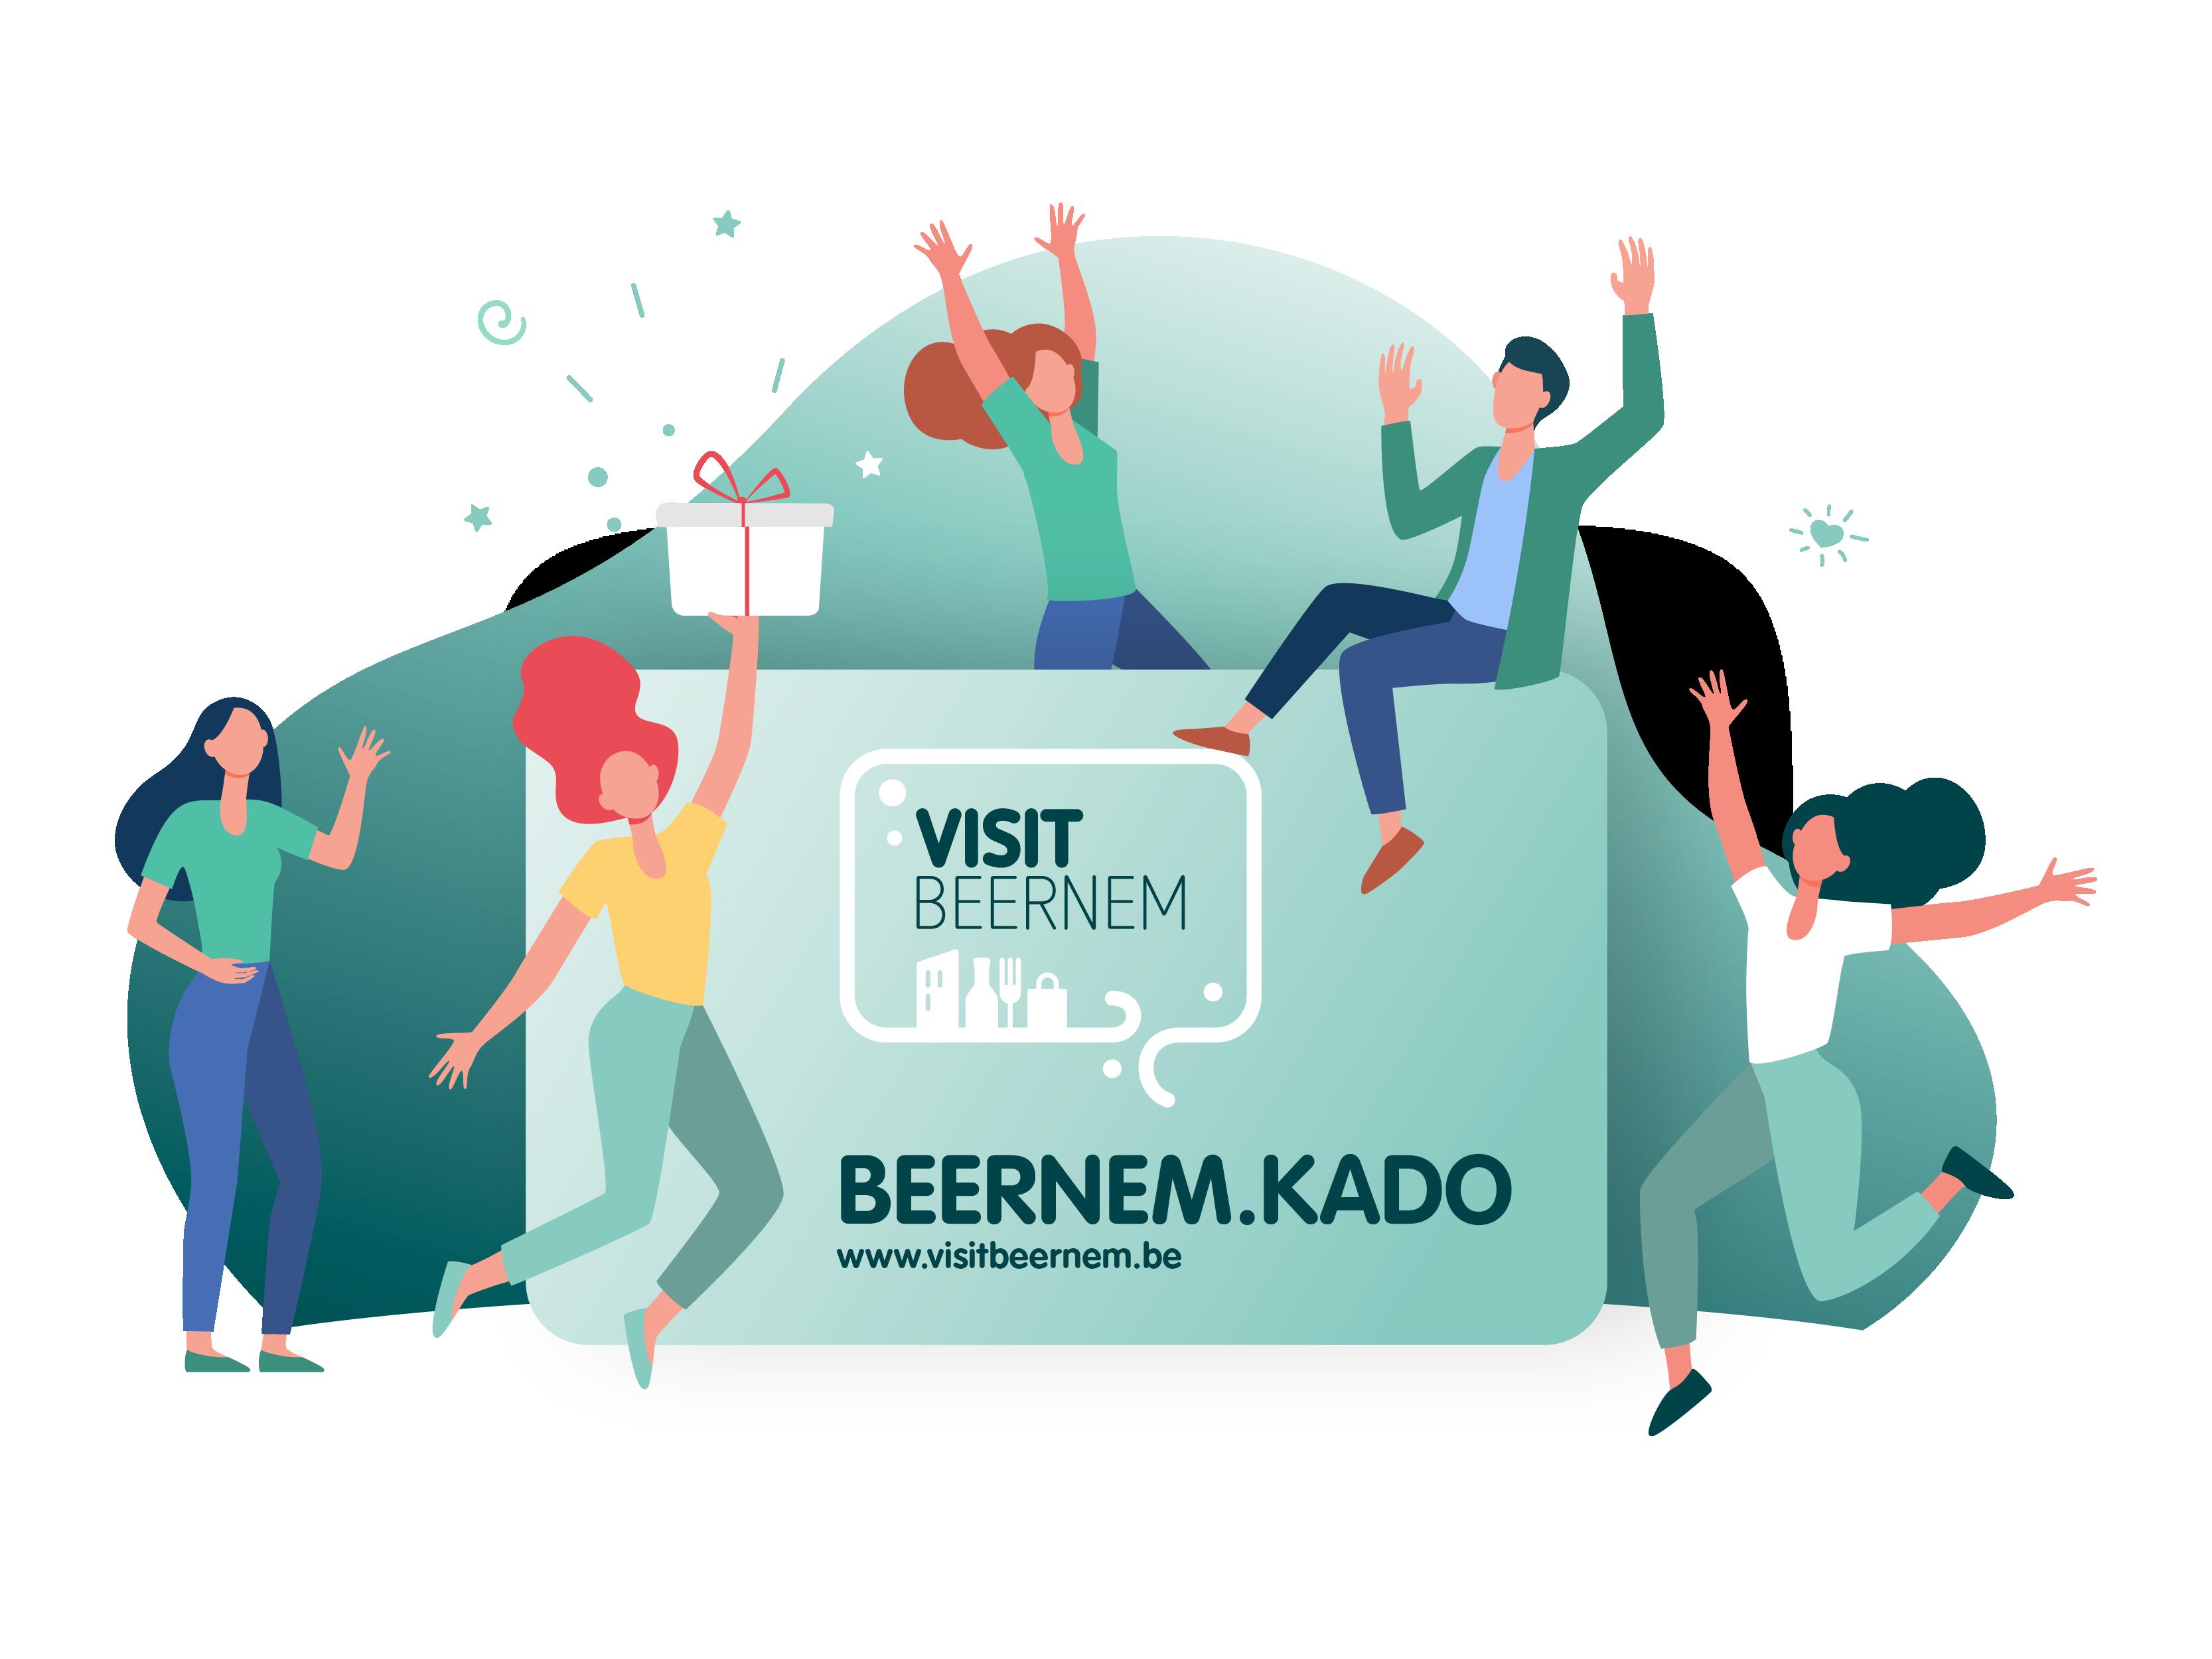 Beernem Kado